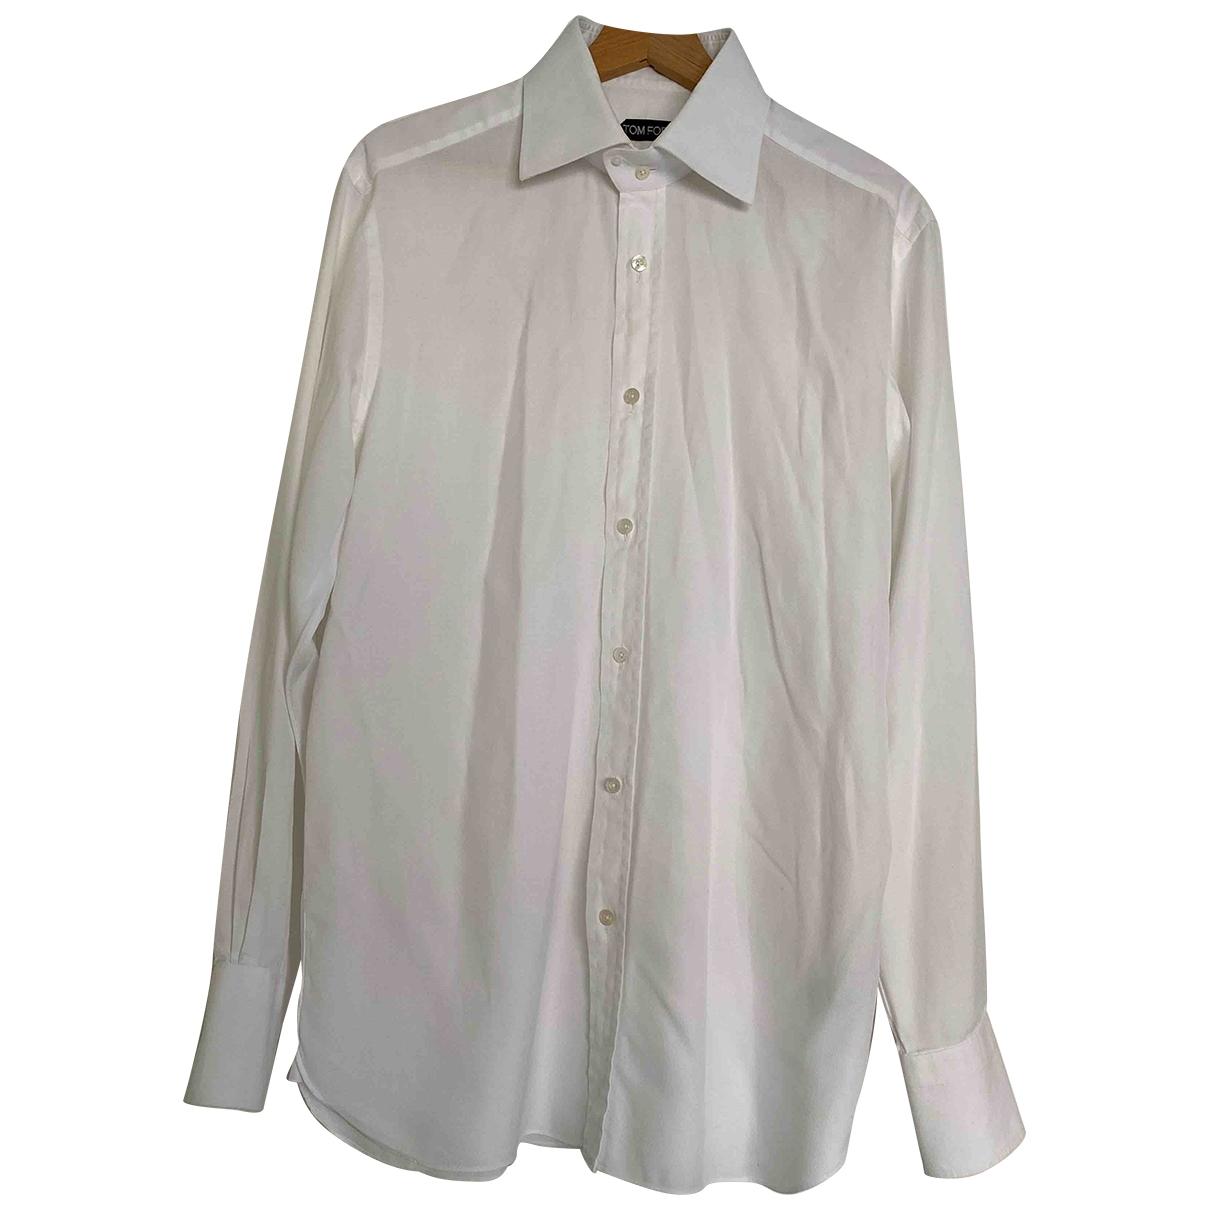 Tom Ford \N White Cotton Shirts for Men 42 EU (tour de cou / collar)